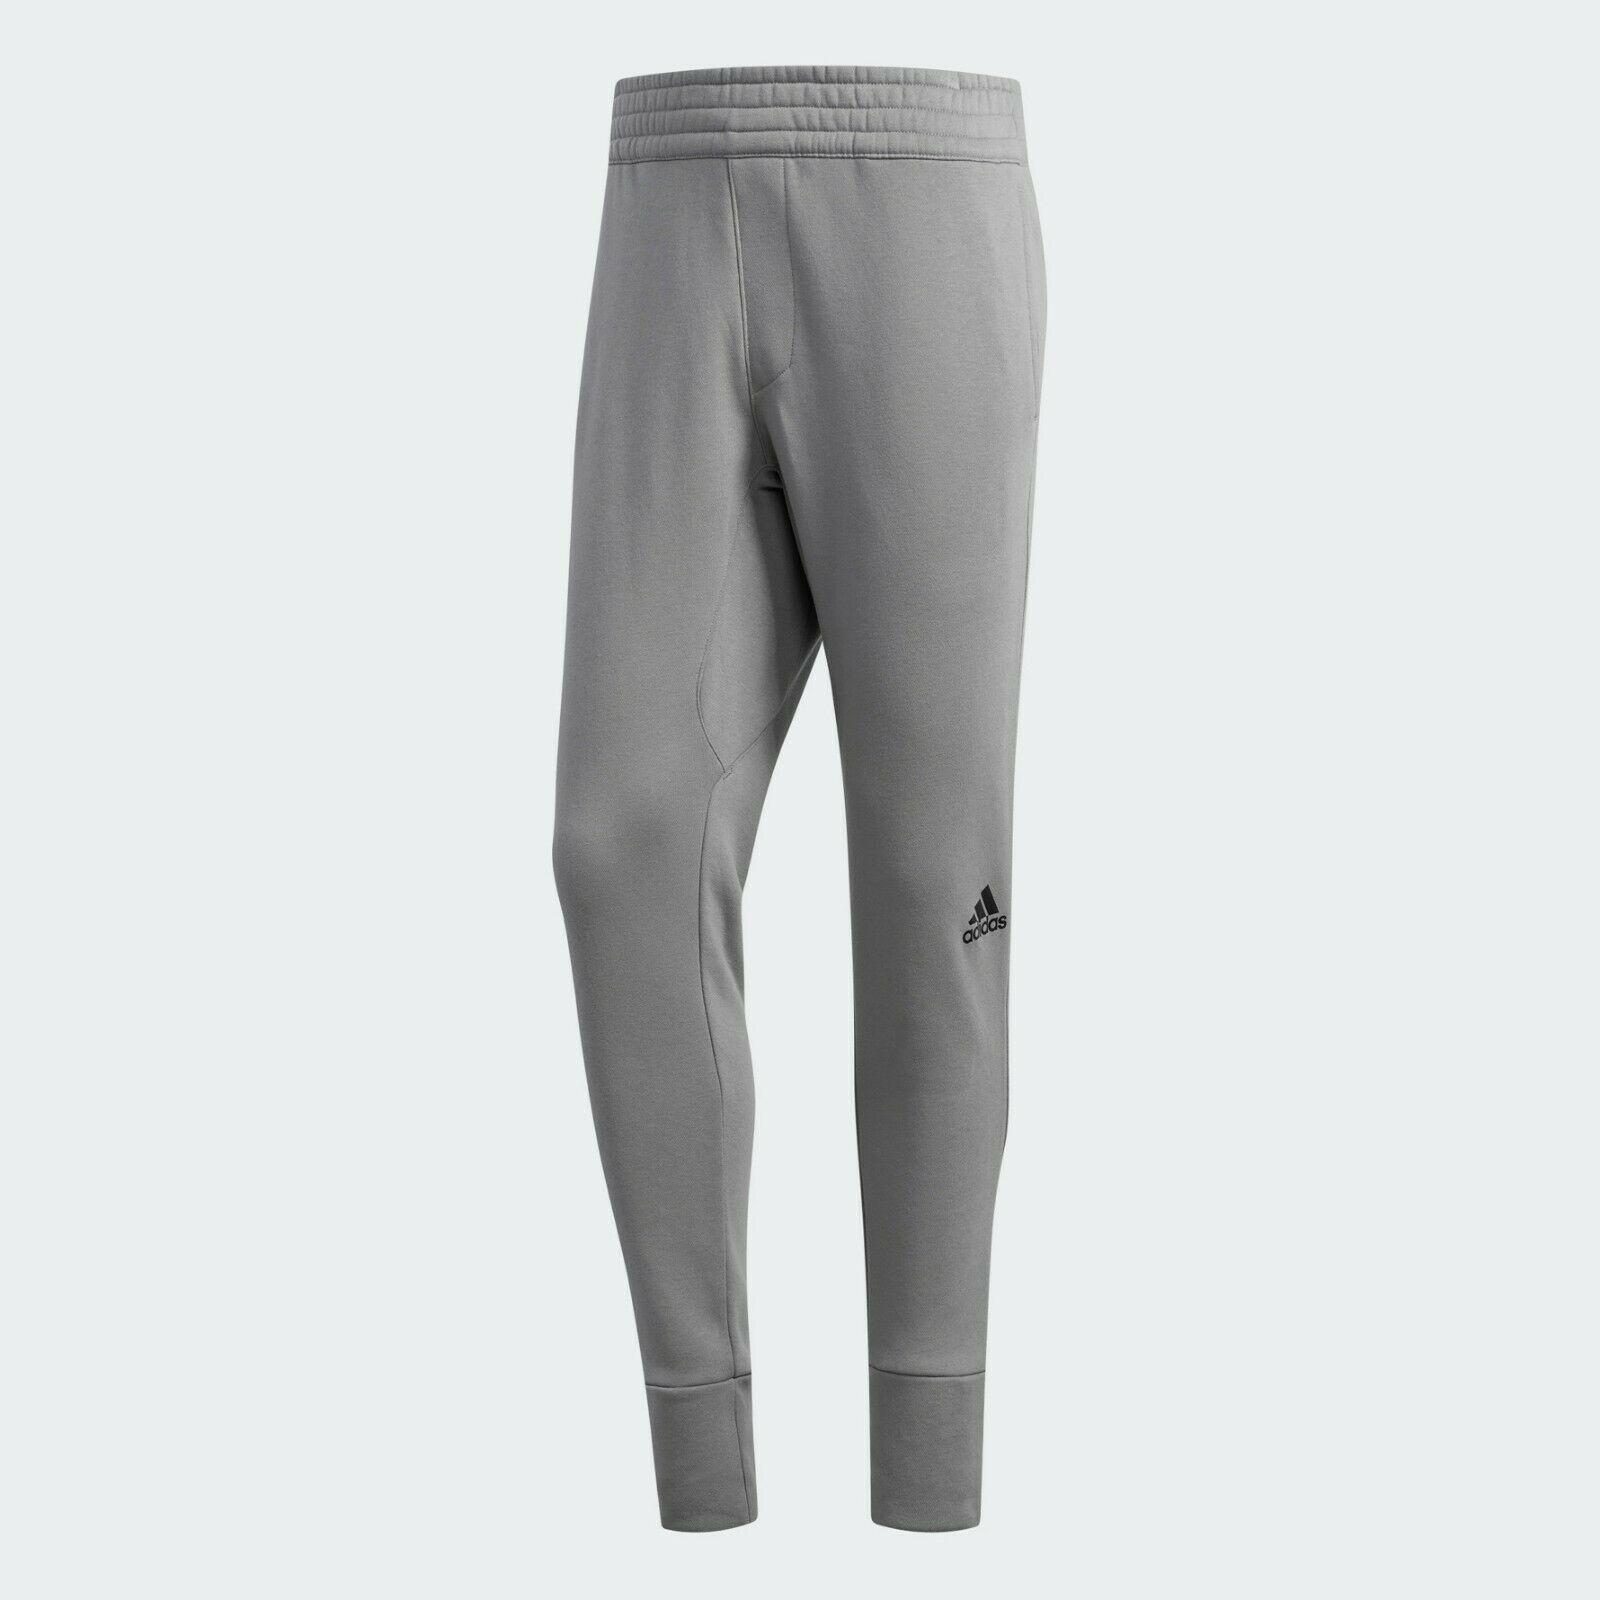 adidas Camo Sweat Track Pant Gym Superstar Fleece Camouflage